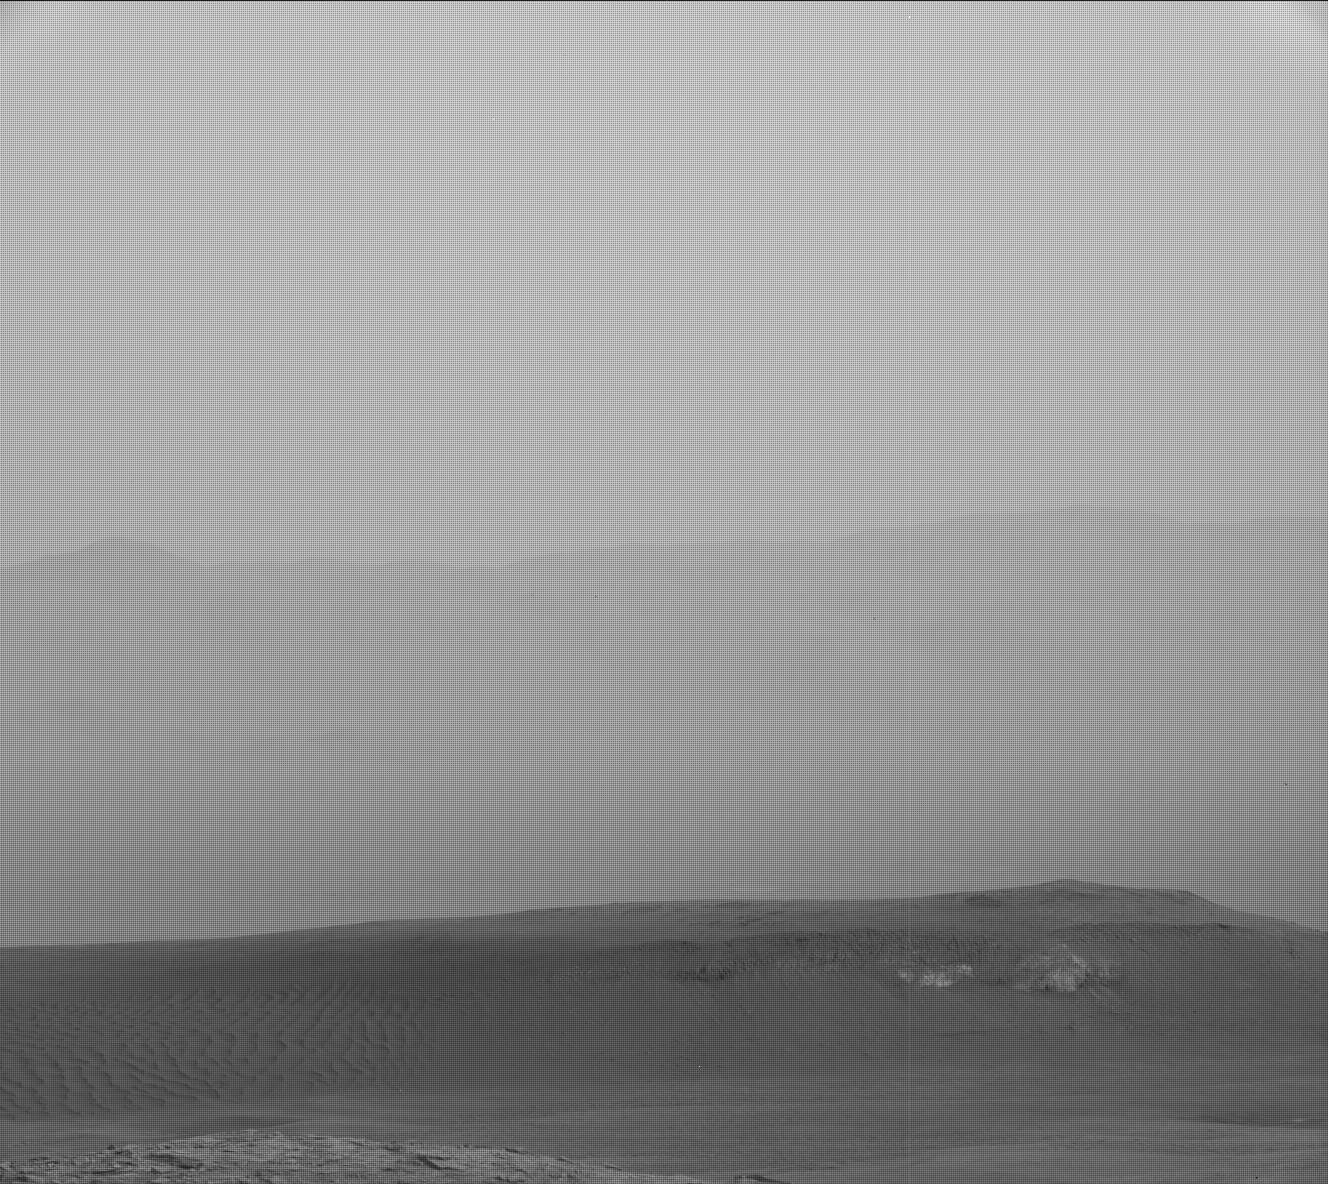 MARS: CURIOSITY u krateru  GALE Vol II. - Page 29 2870ML0149730001100539C00_DXXX